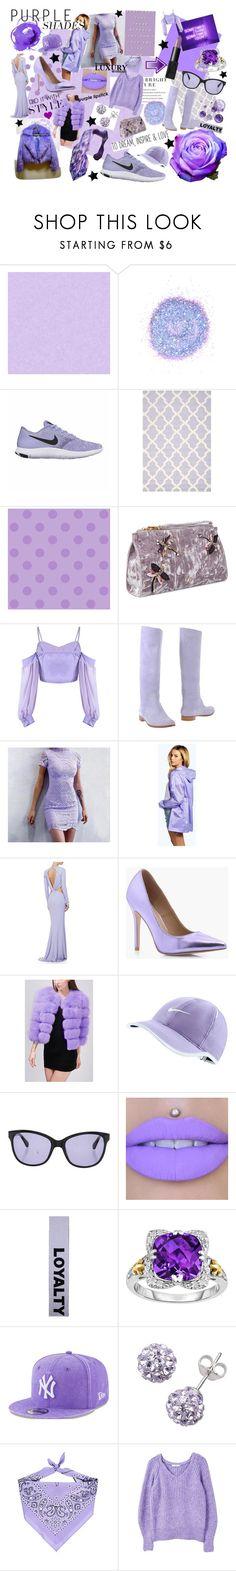 """Purple Shades"" by miss-sj-xo ❤ liked on Polyvore featuring York Wallcoverings, The Gypsy Shrine, NIKE, Safavieh, Nine West, Sergio Rossi, Boohoo, Cushnie Et Ochs, Zac Posen and Versace"